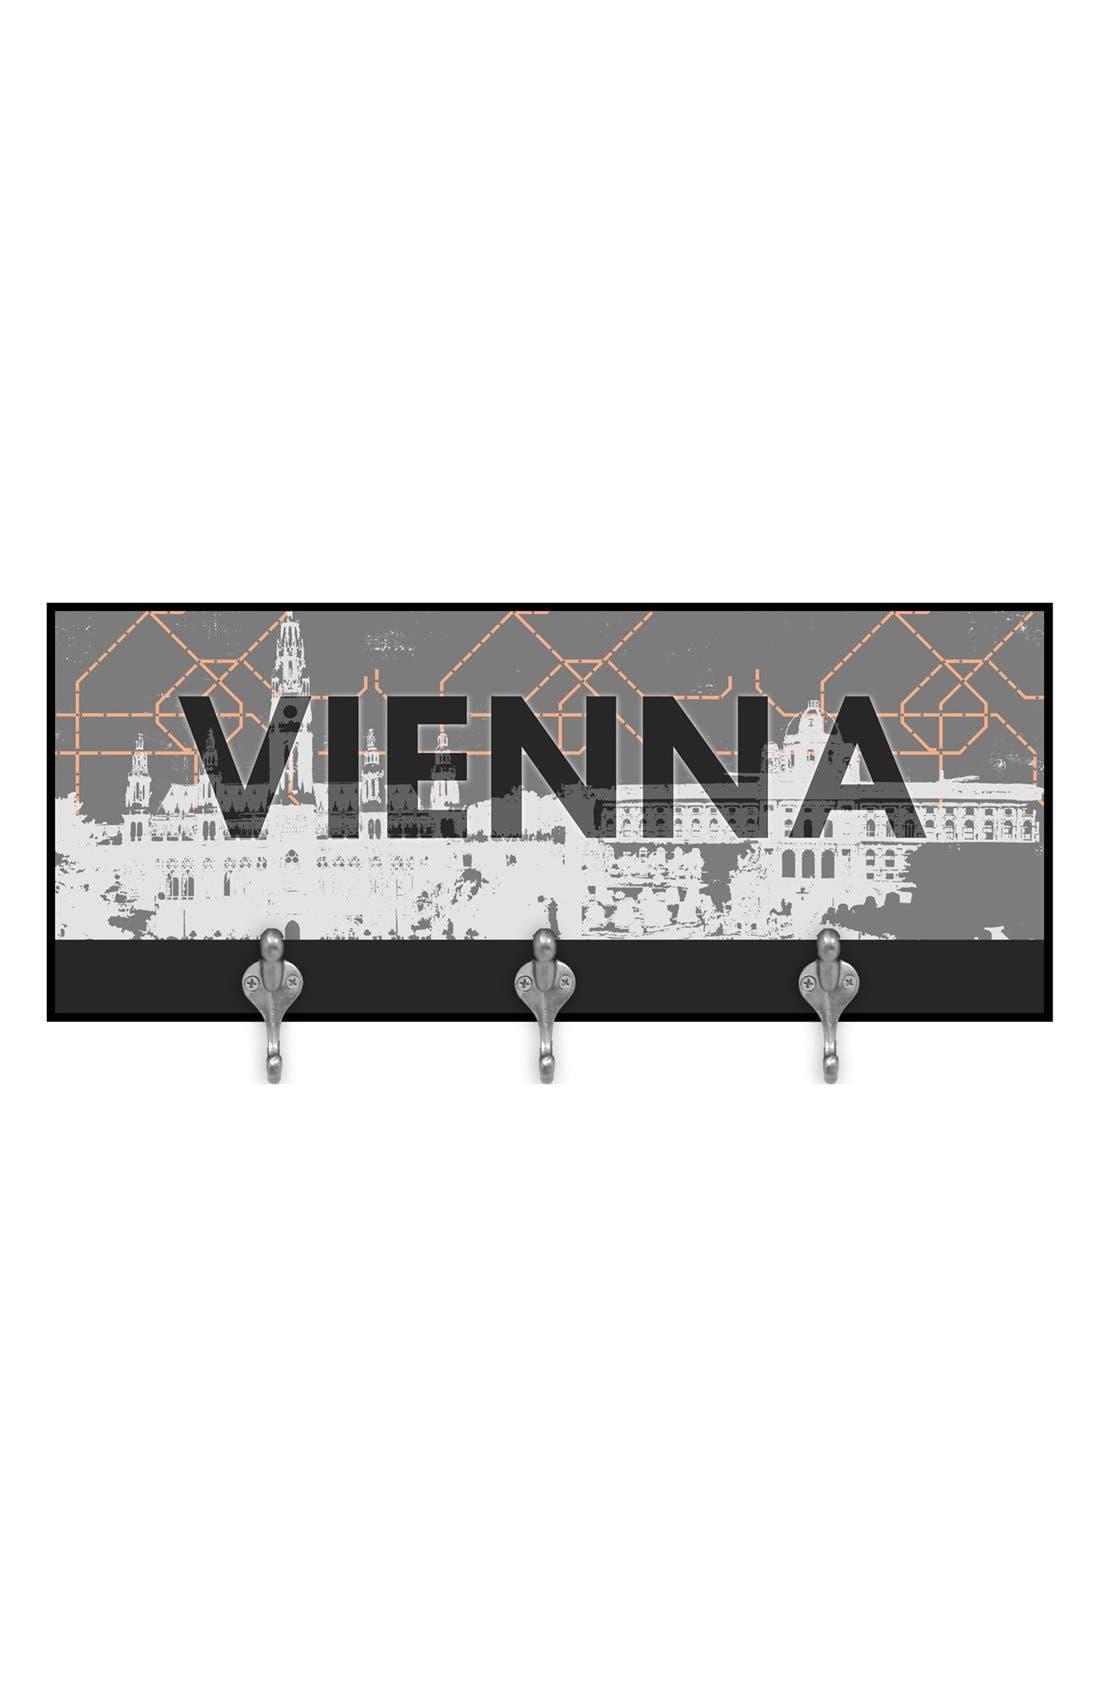 Alternate Image 1 Selected - Green Leaf Art 'Vienna' Multi Hook Wall Mount Rack